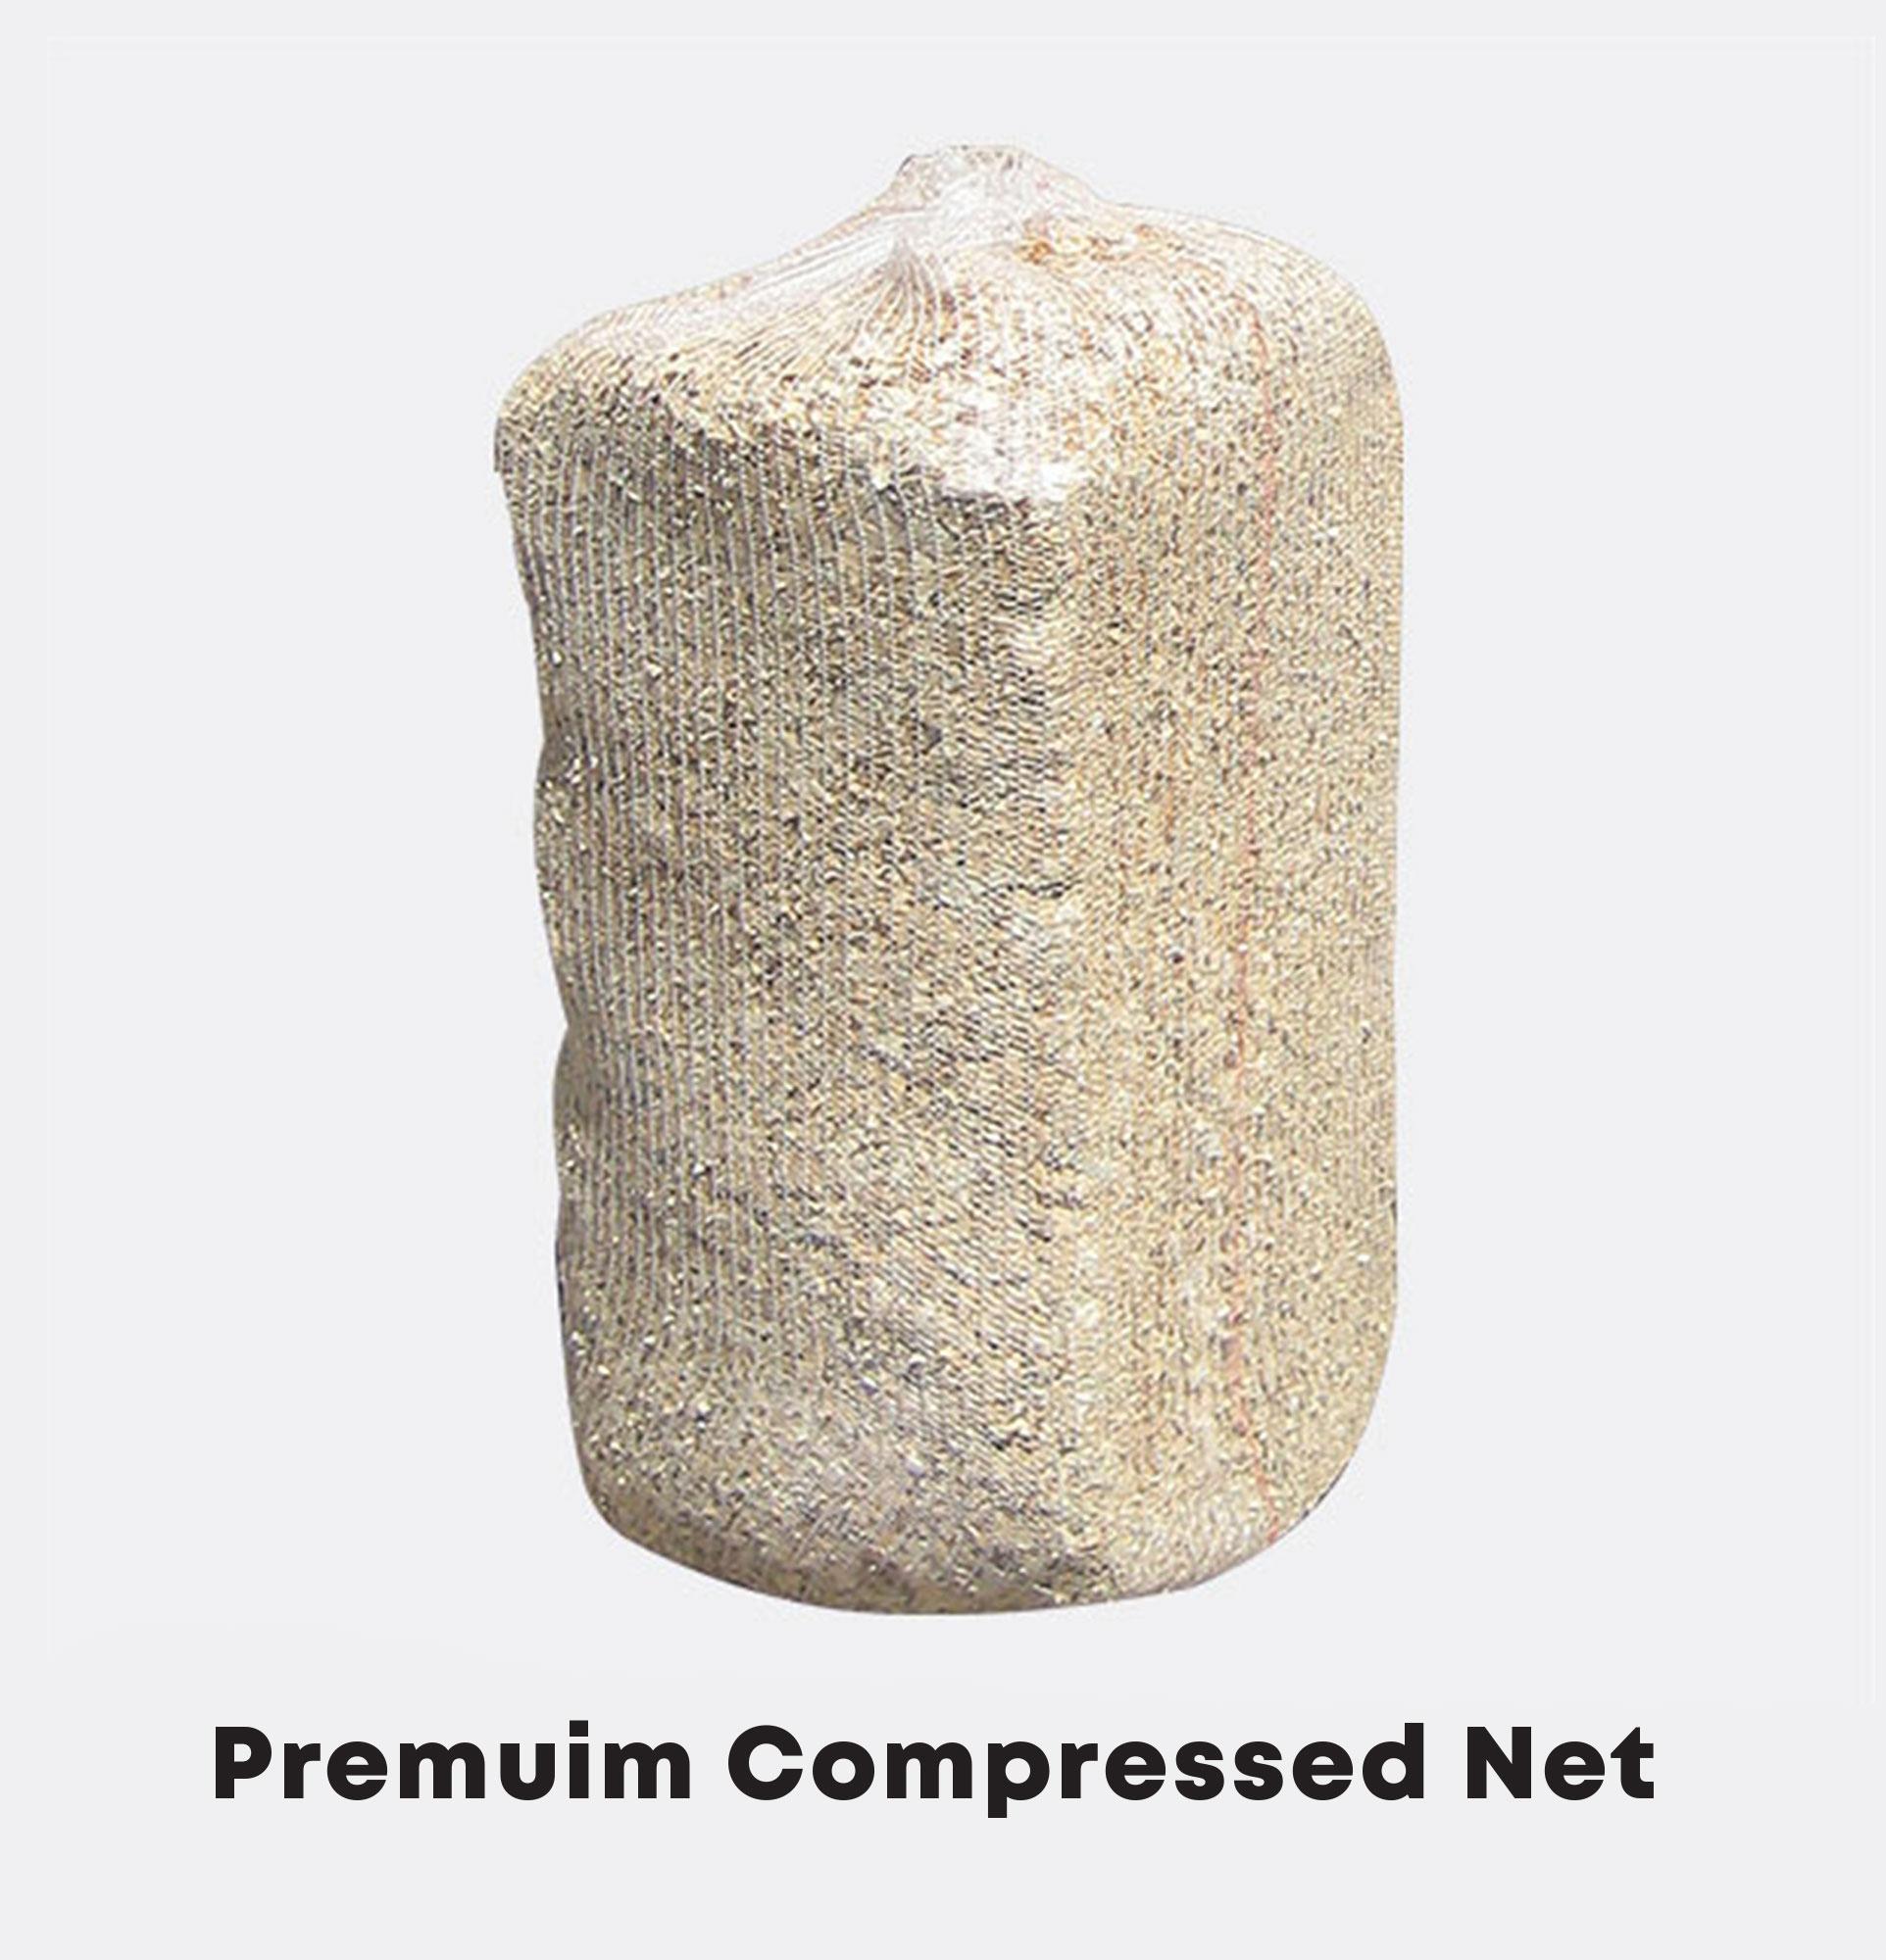 Premuim-Compressed-Net